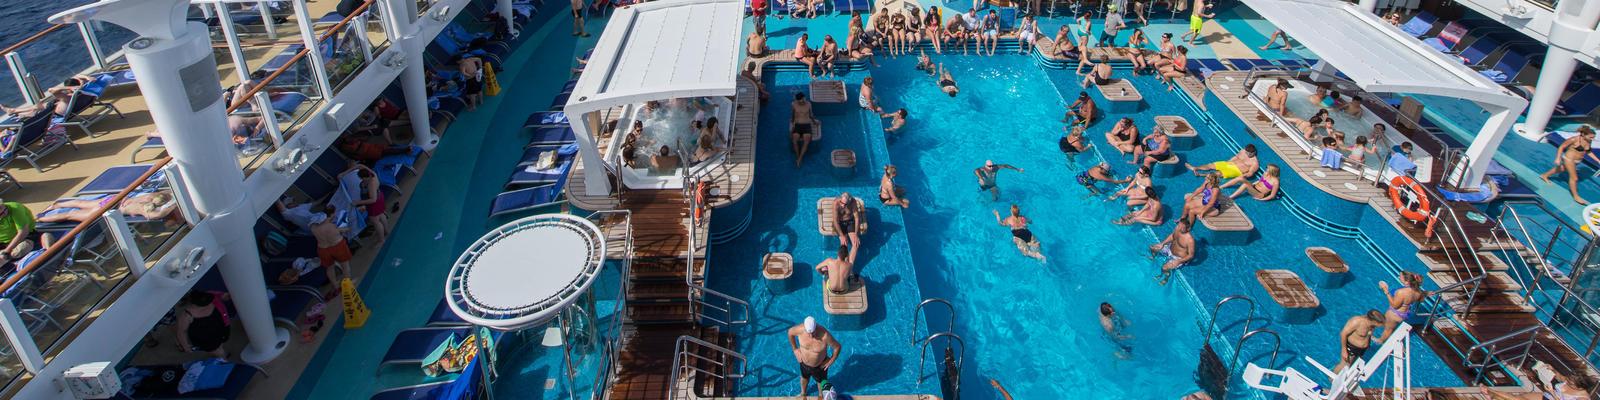 The Pool on Norwegian Escape